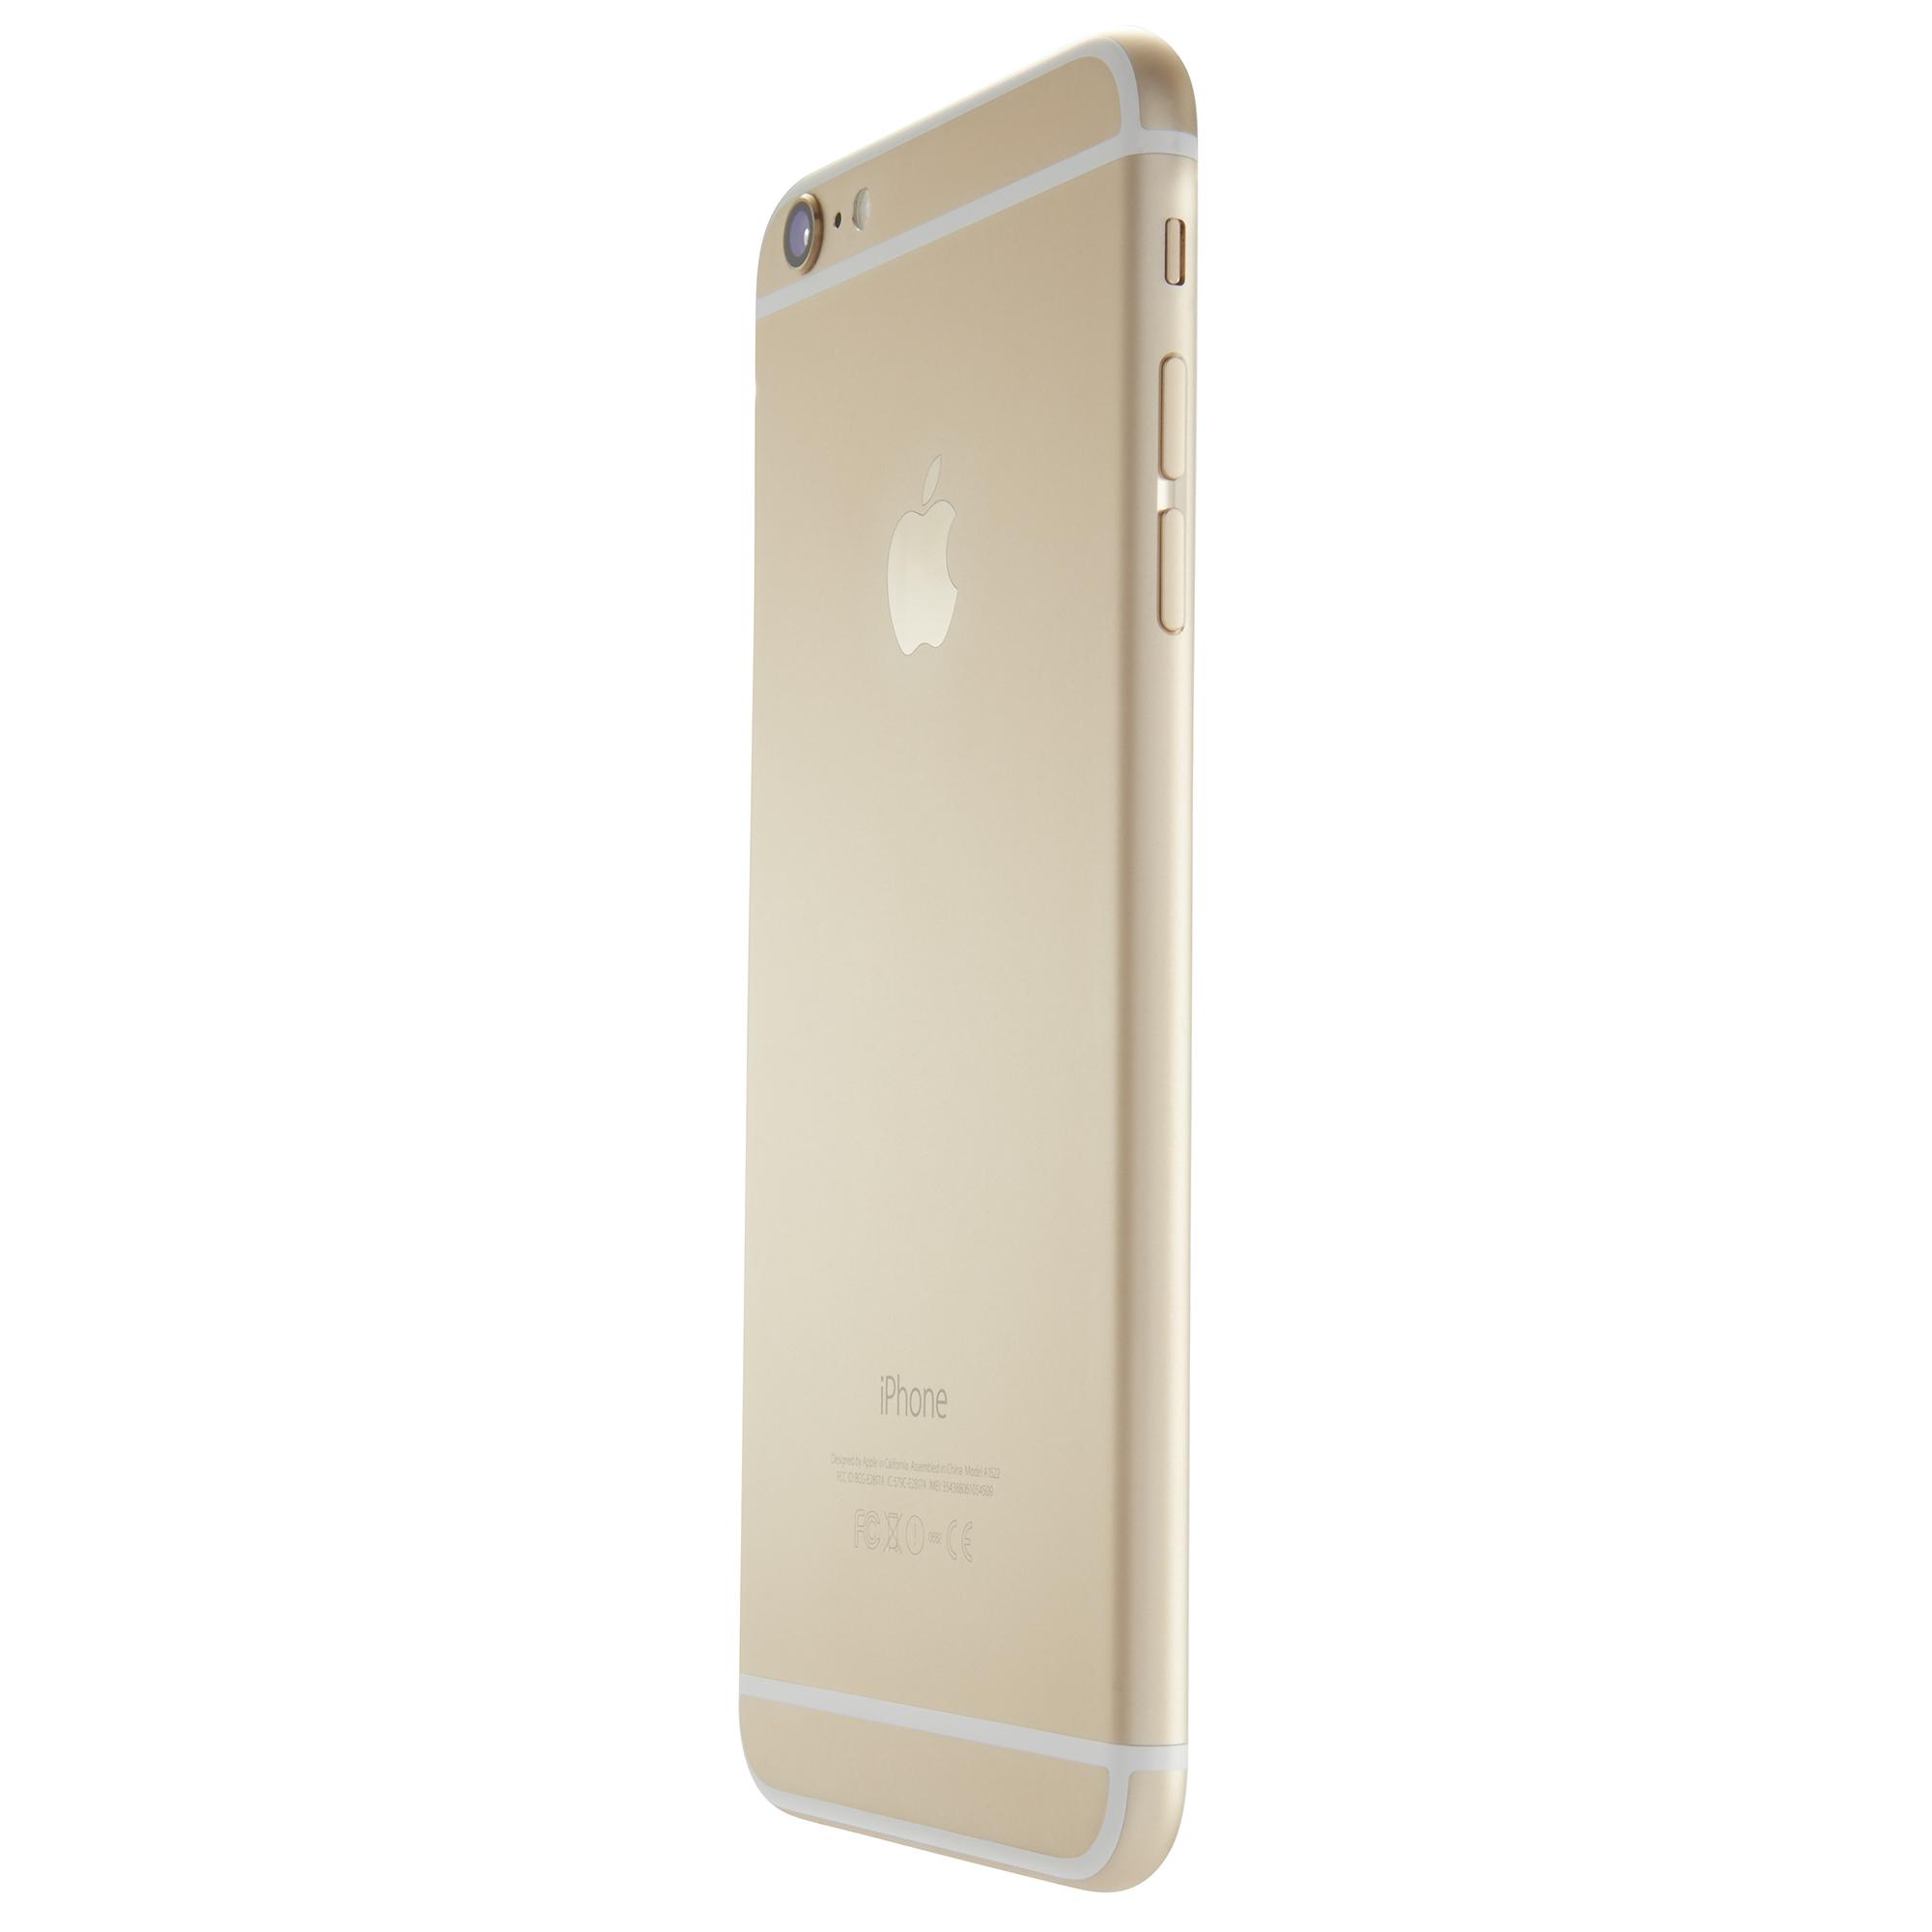 apple iphone 6 plus a1522 16gb verizon unlocked. Black Bedroom Furniture Sets. Home Design Ideas